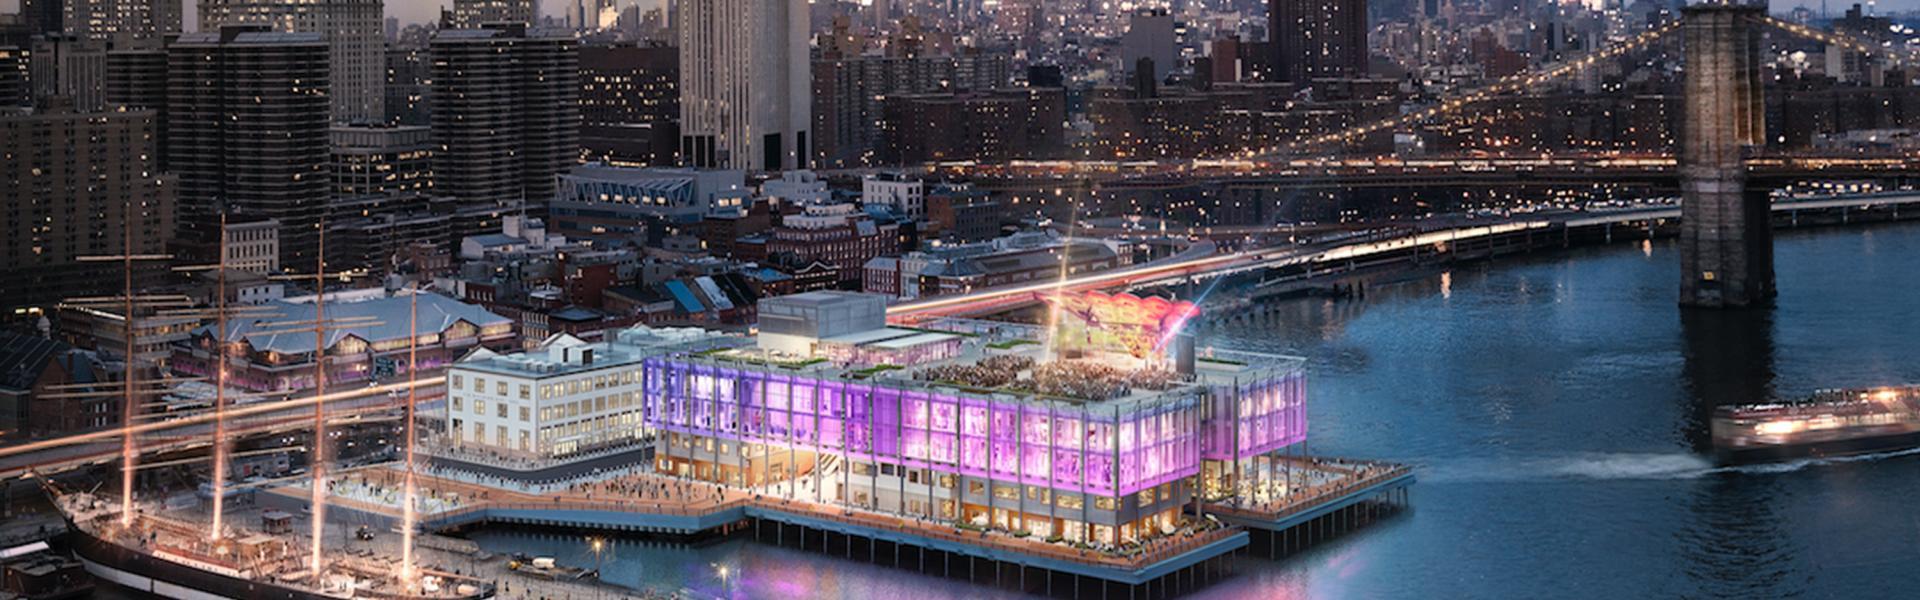 Pier 17 Seaport rendering copy